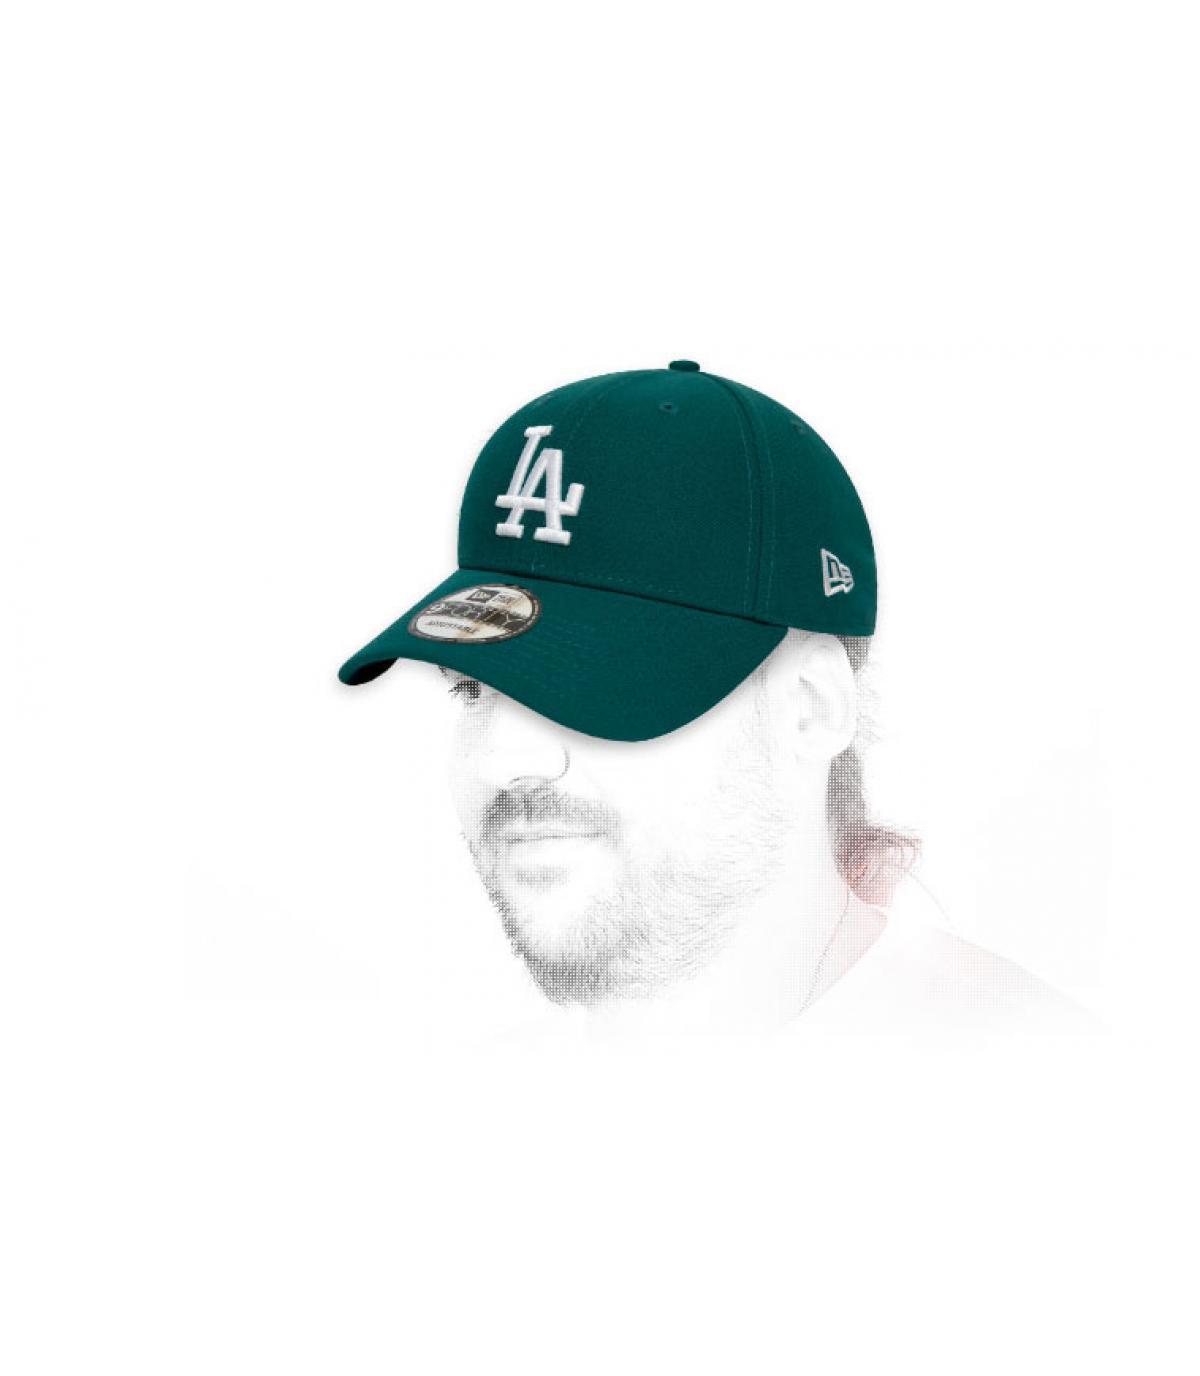 LA cap green white